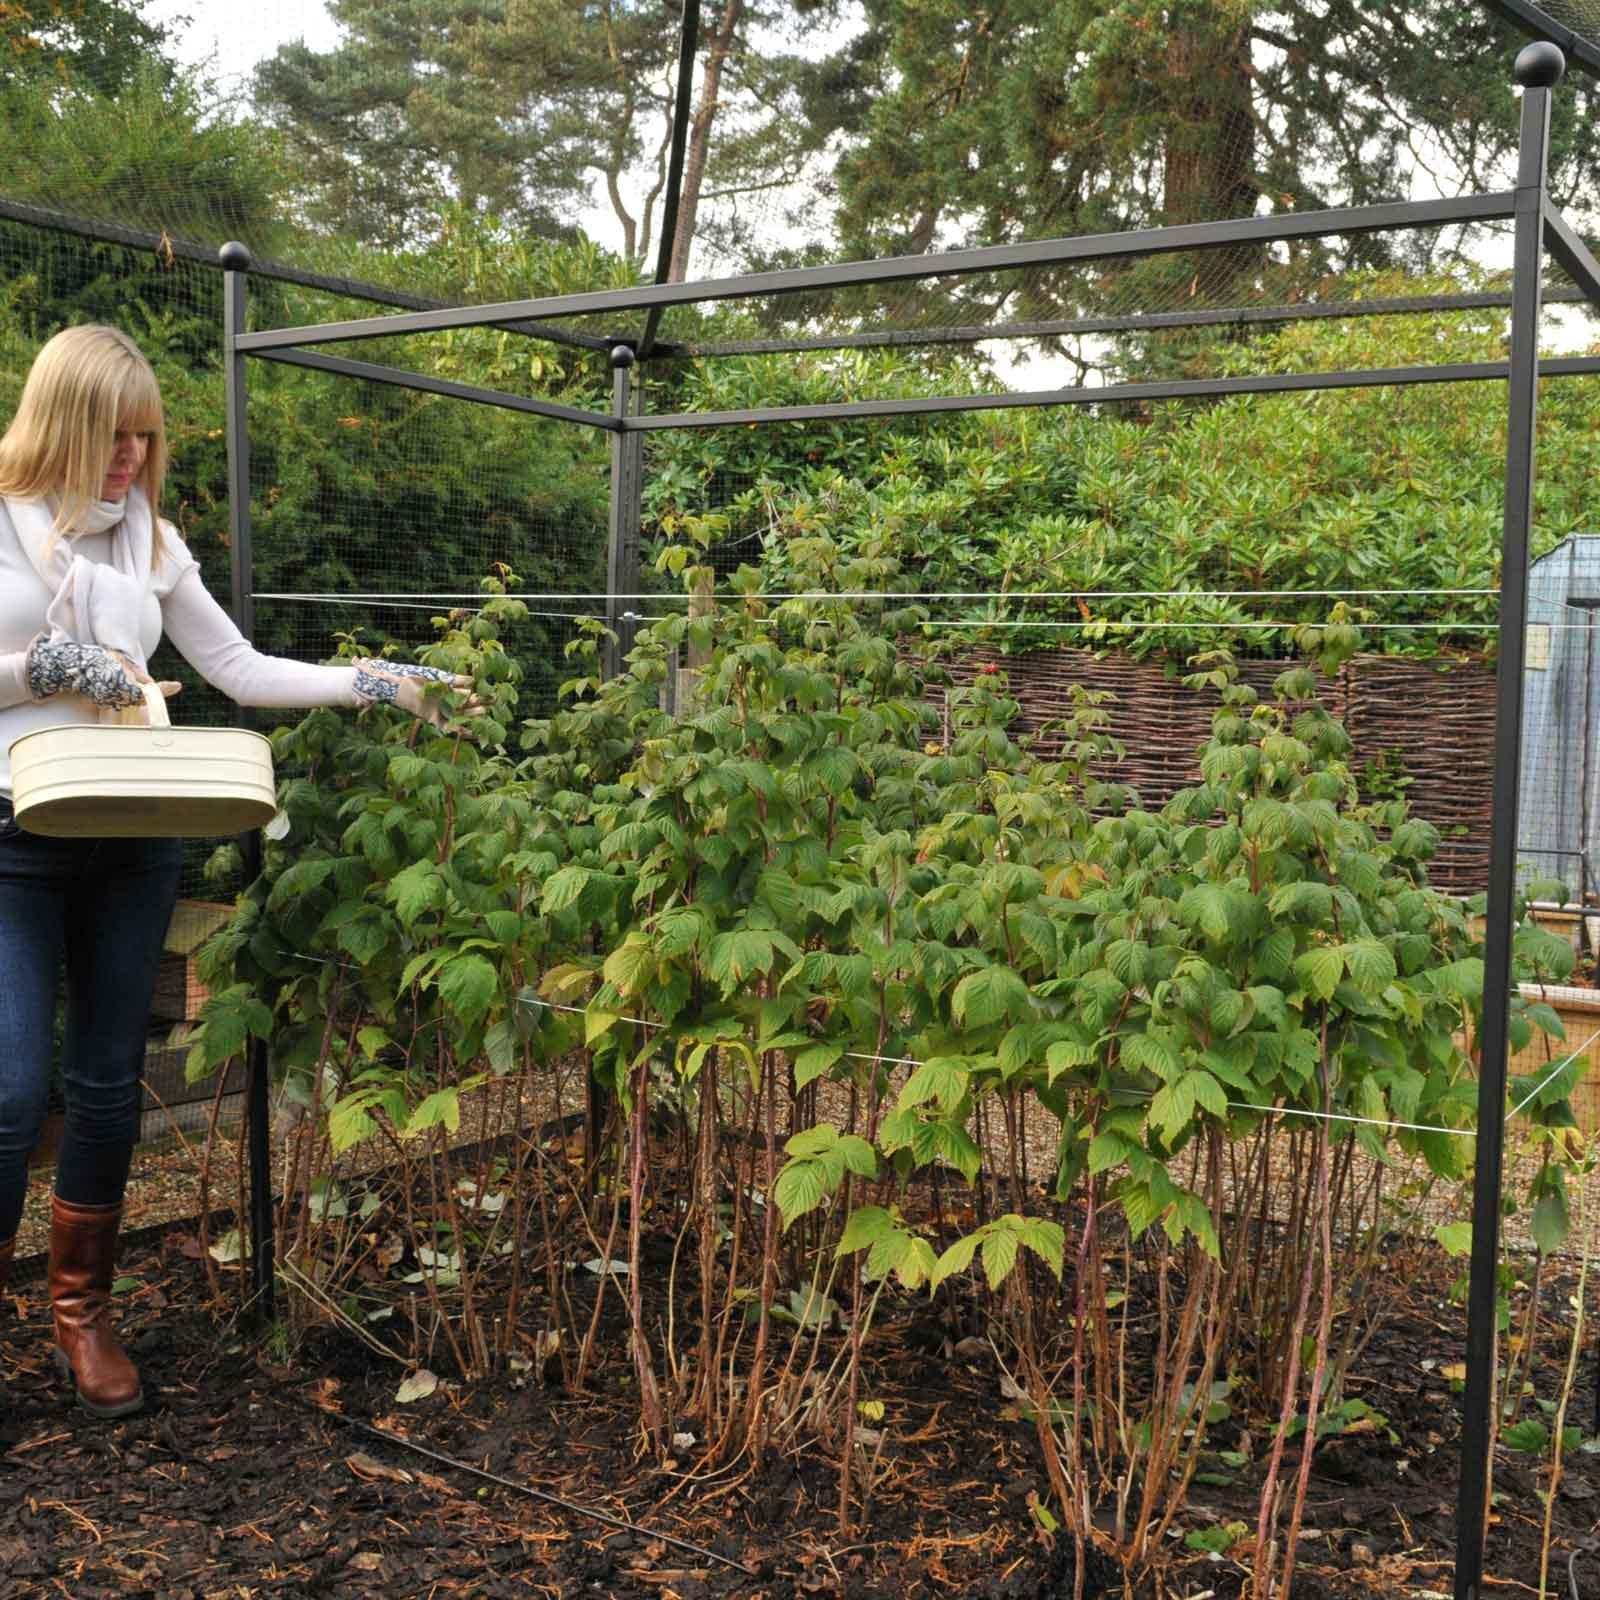 Autumn Raspberry Support Frames Harrod Horticultural